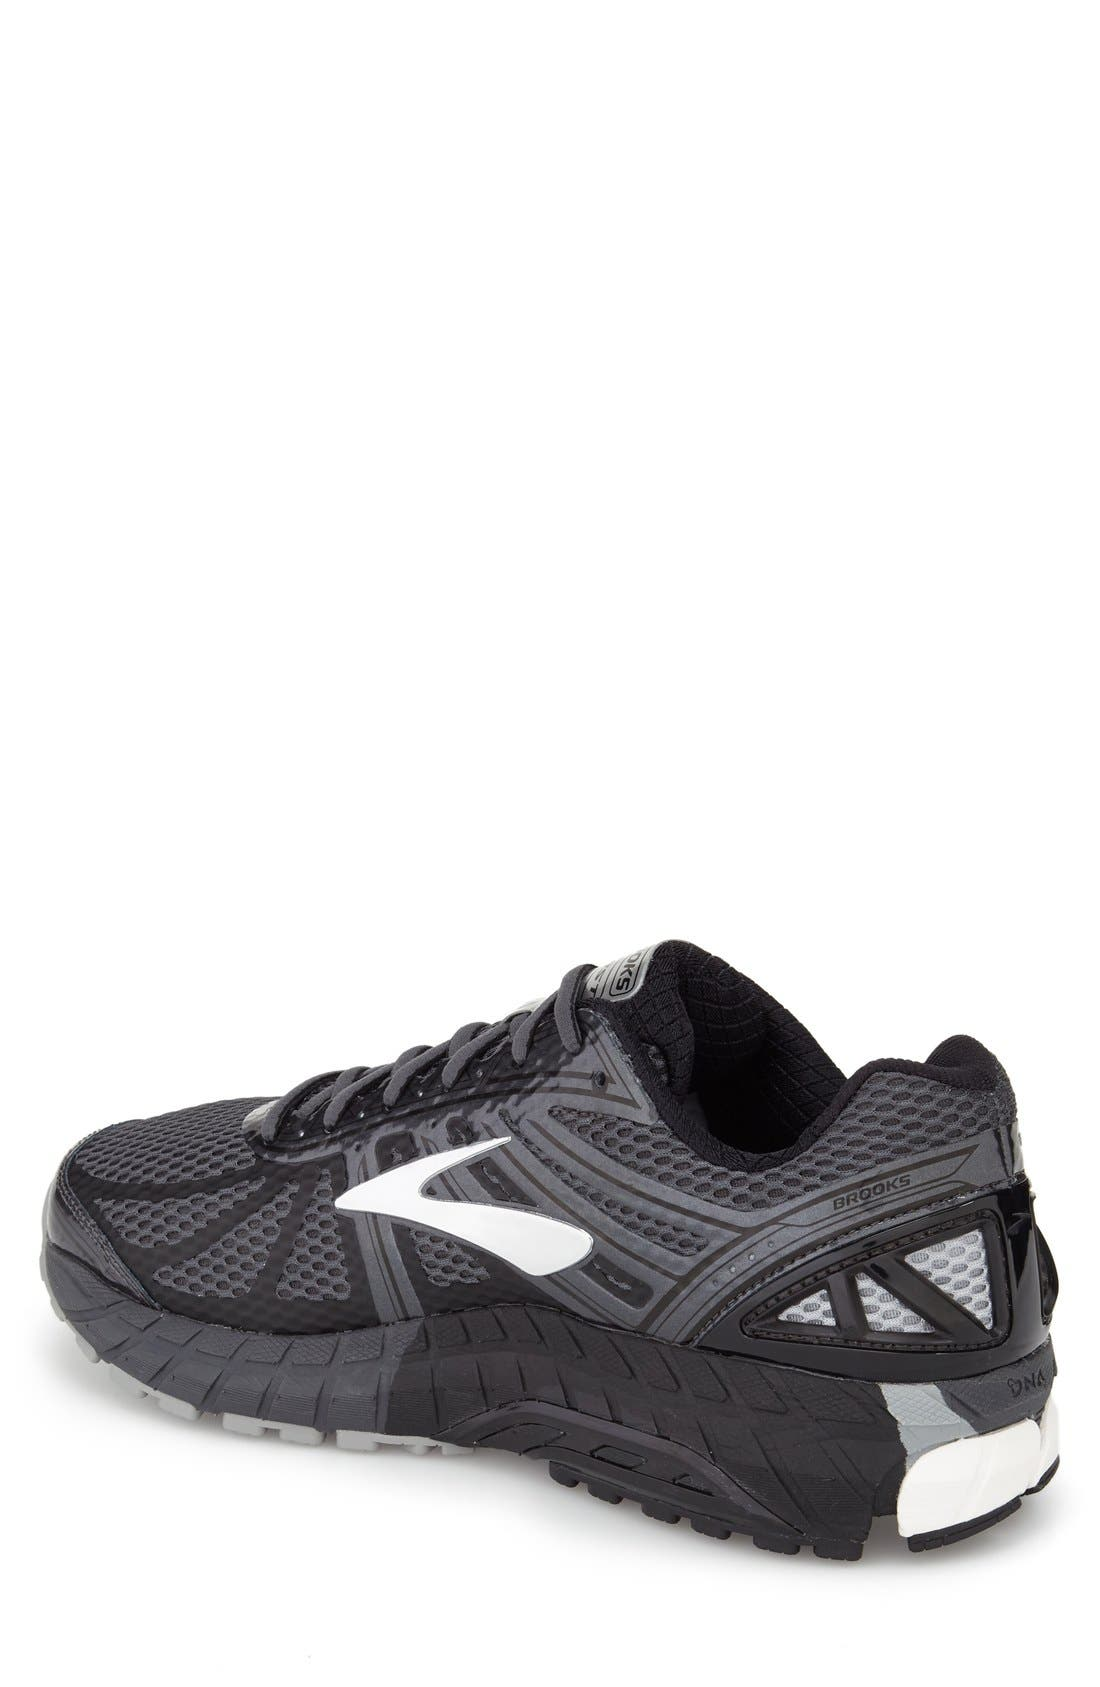 'Beast 16' Running Shoe,                             Alternate thumbnail 4, color,